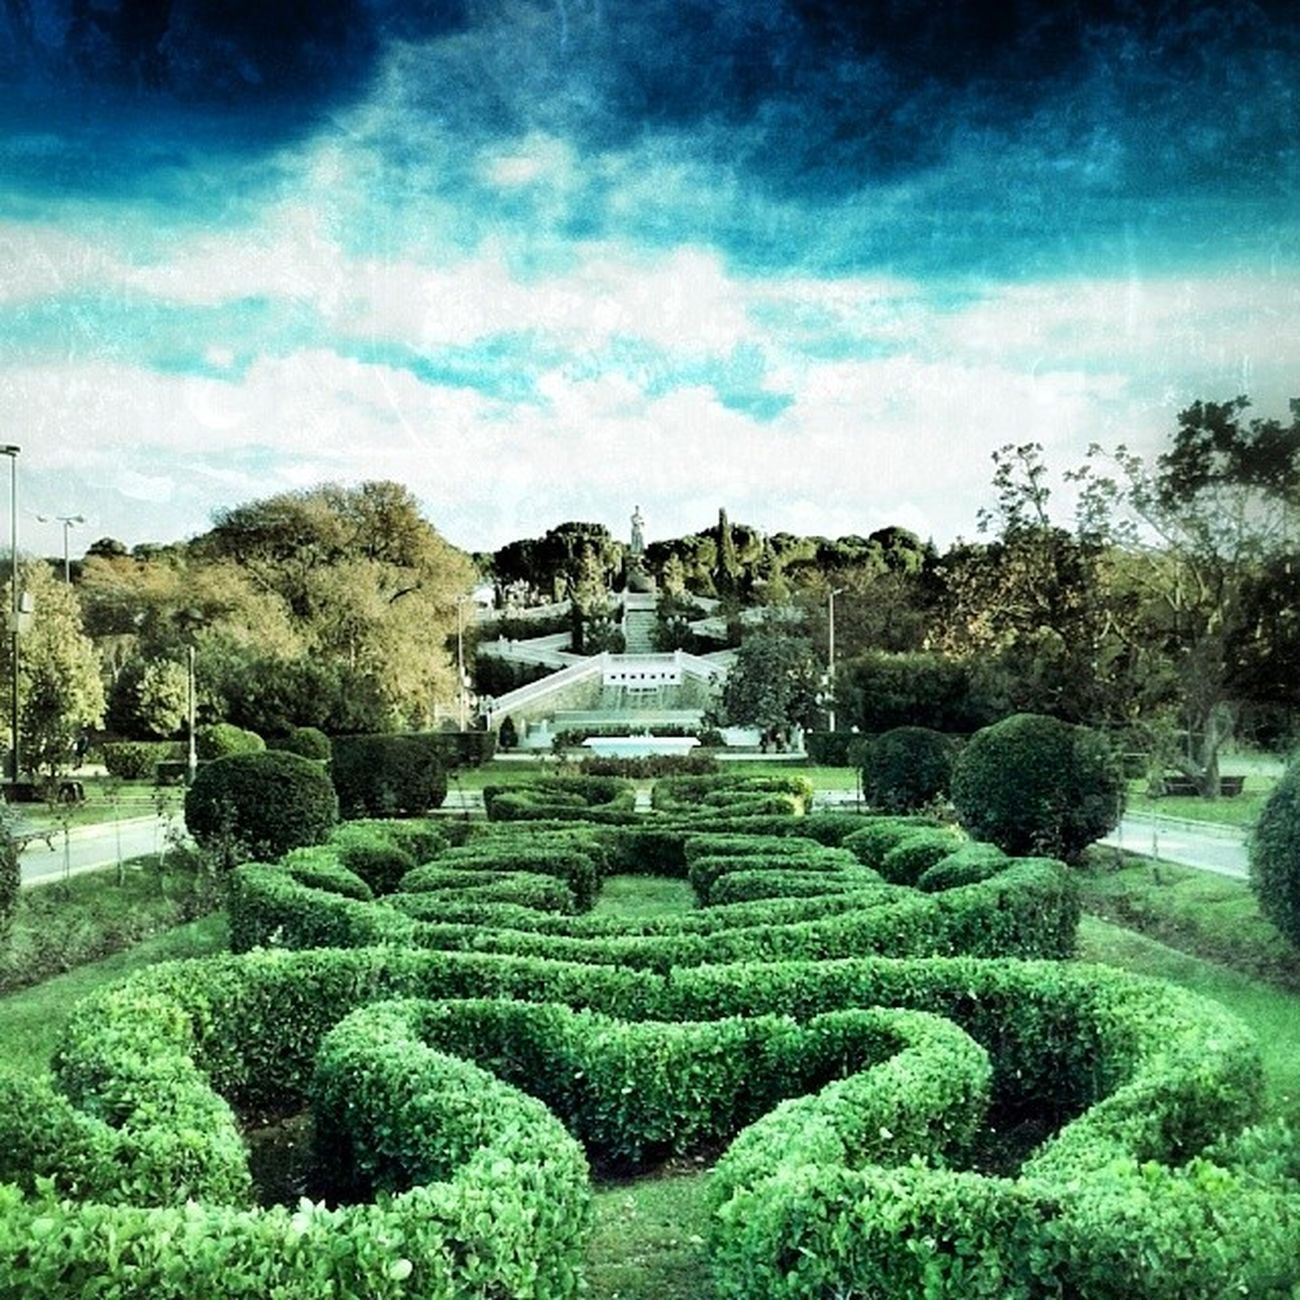 ParqueJoseAntonioLabordeta Zaragoza Jardines Igersaragon igerszgz